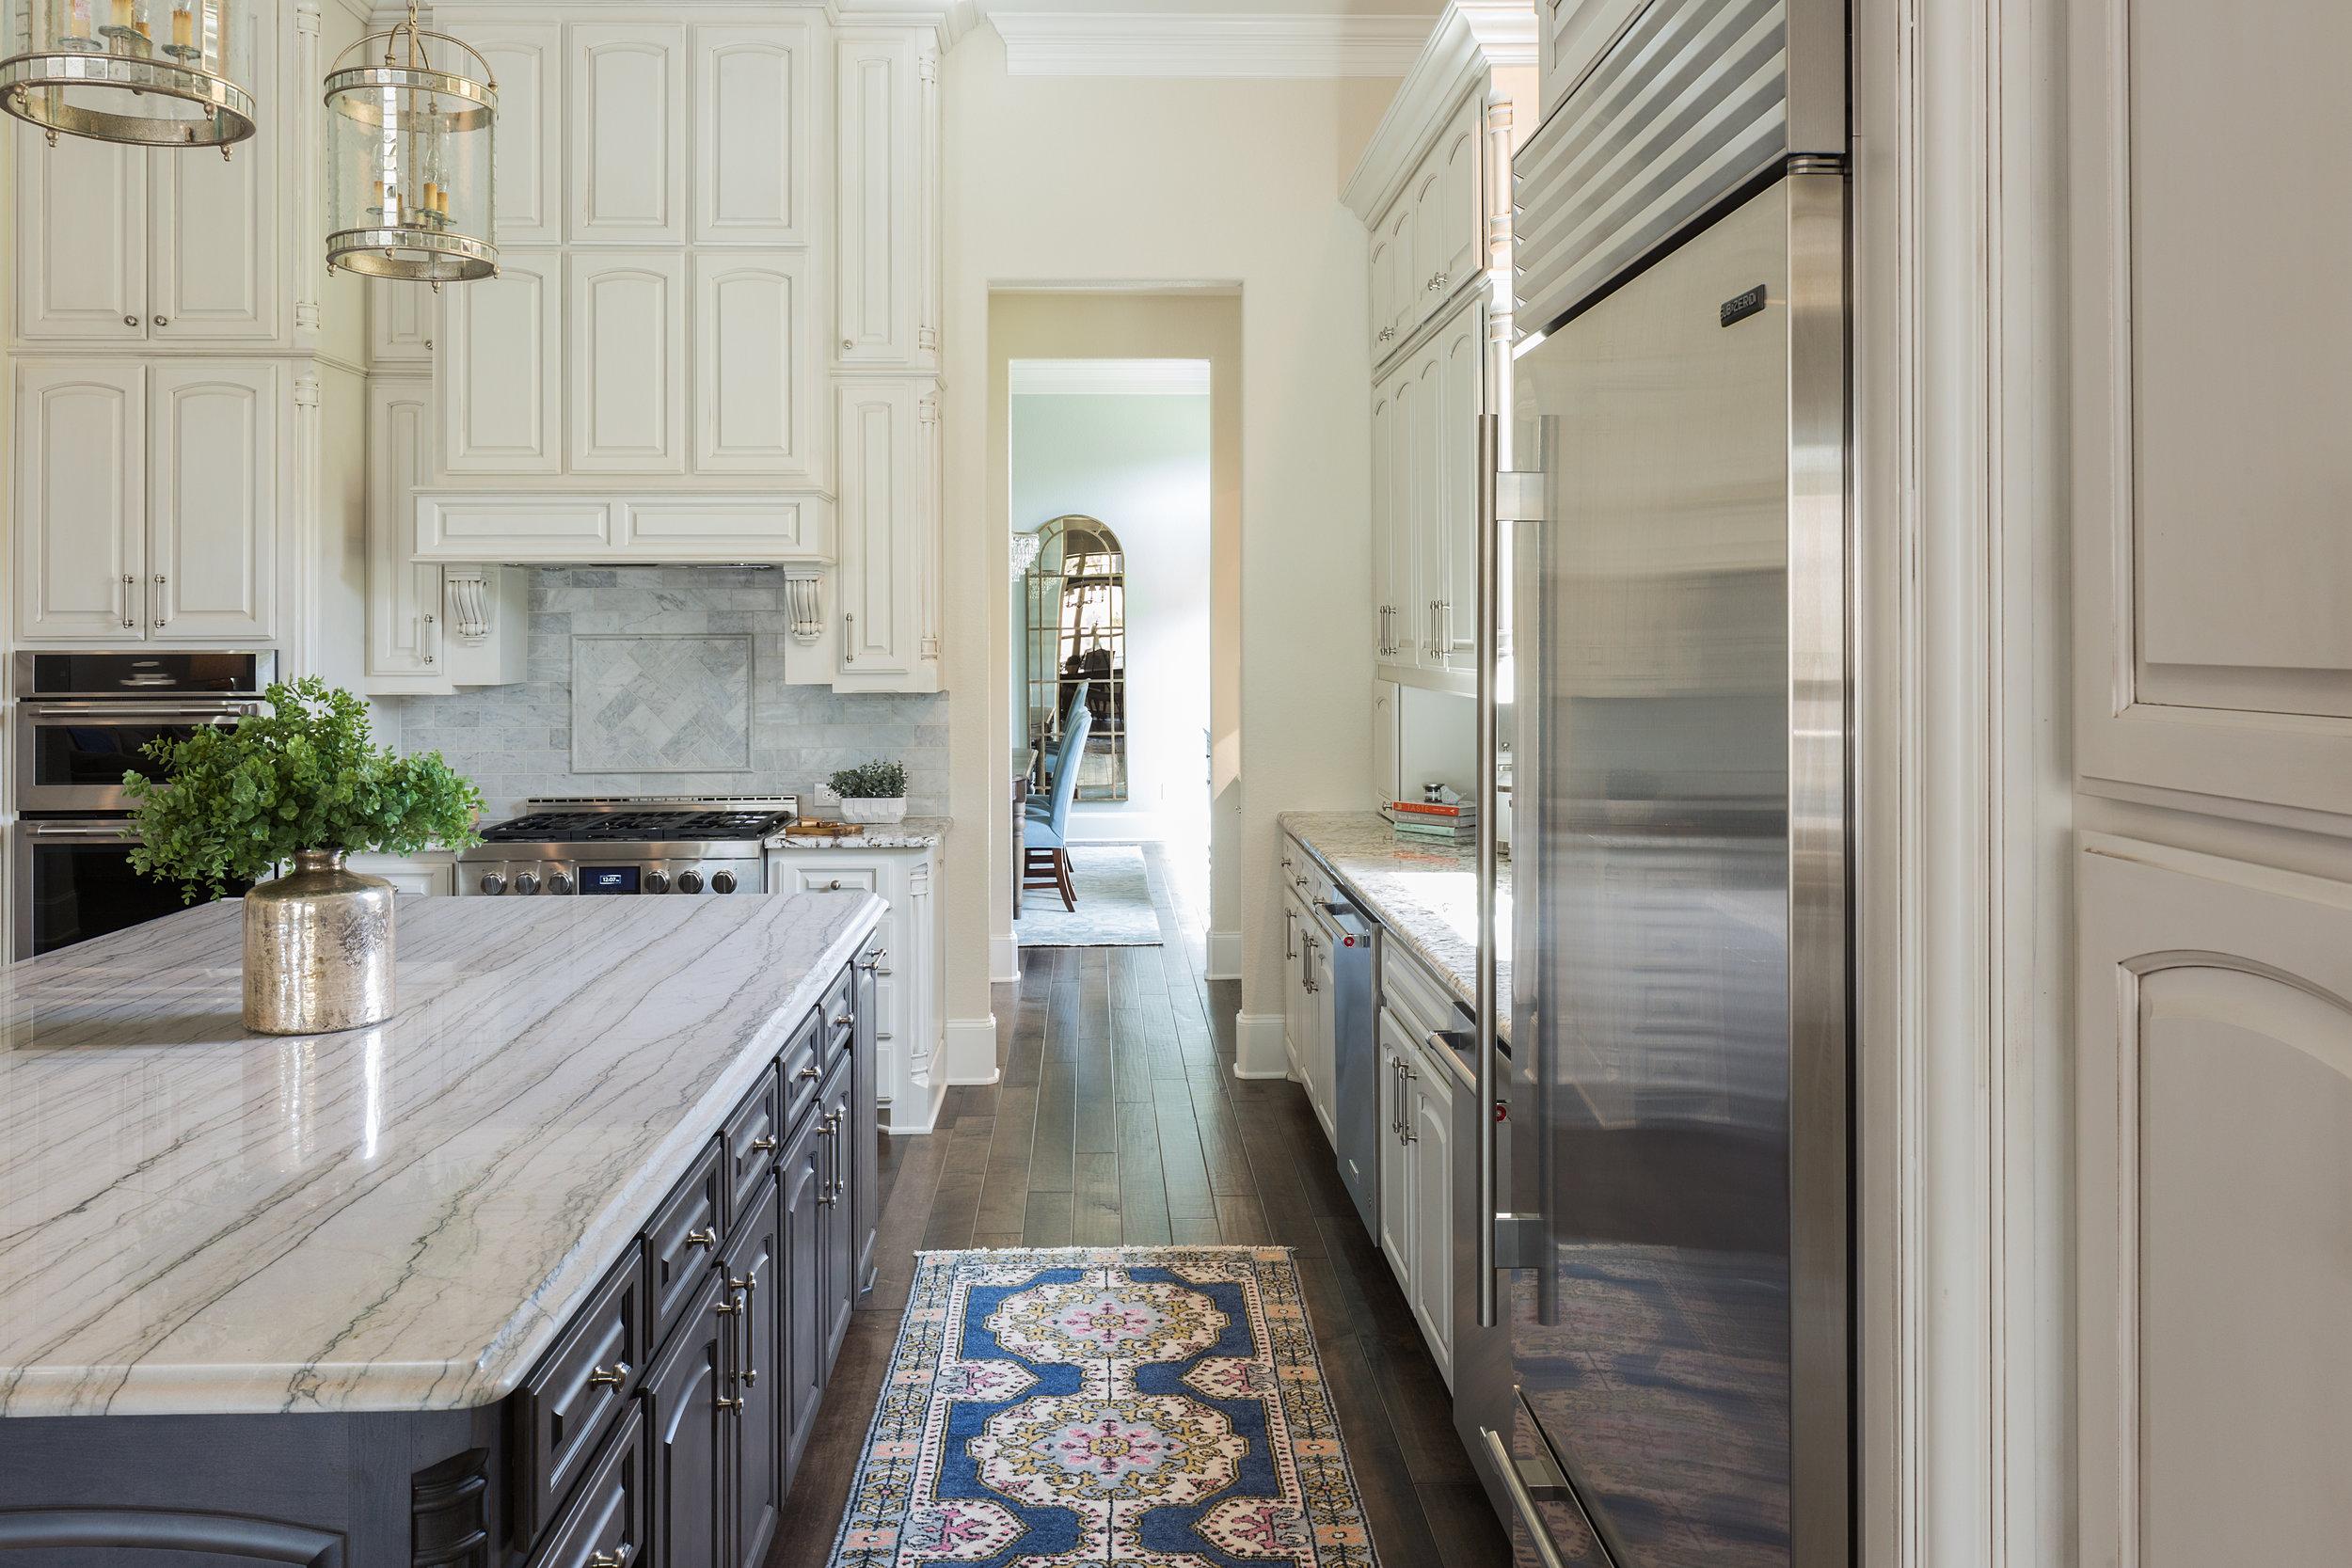 Room Reveal: Texas Kitchen